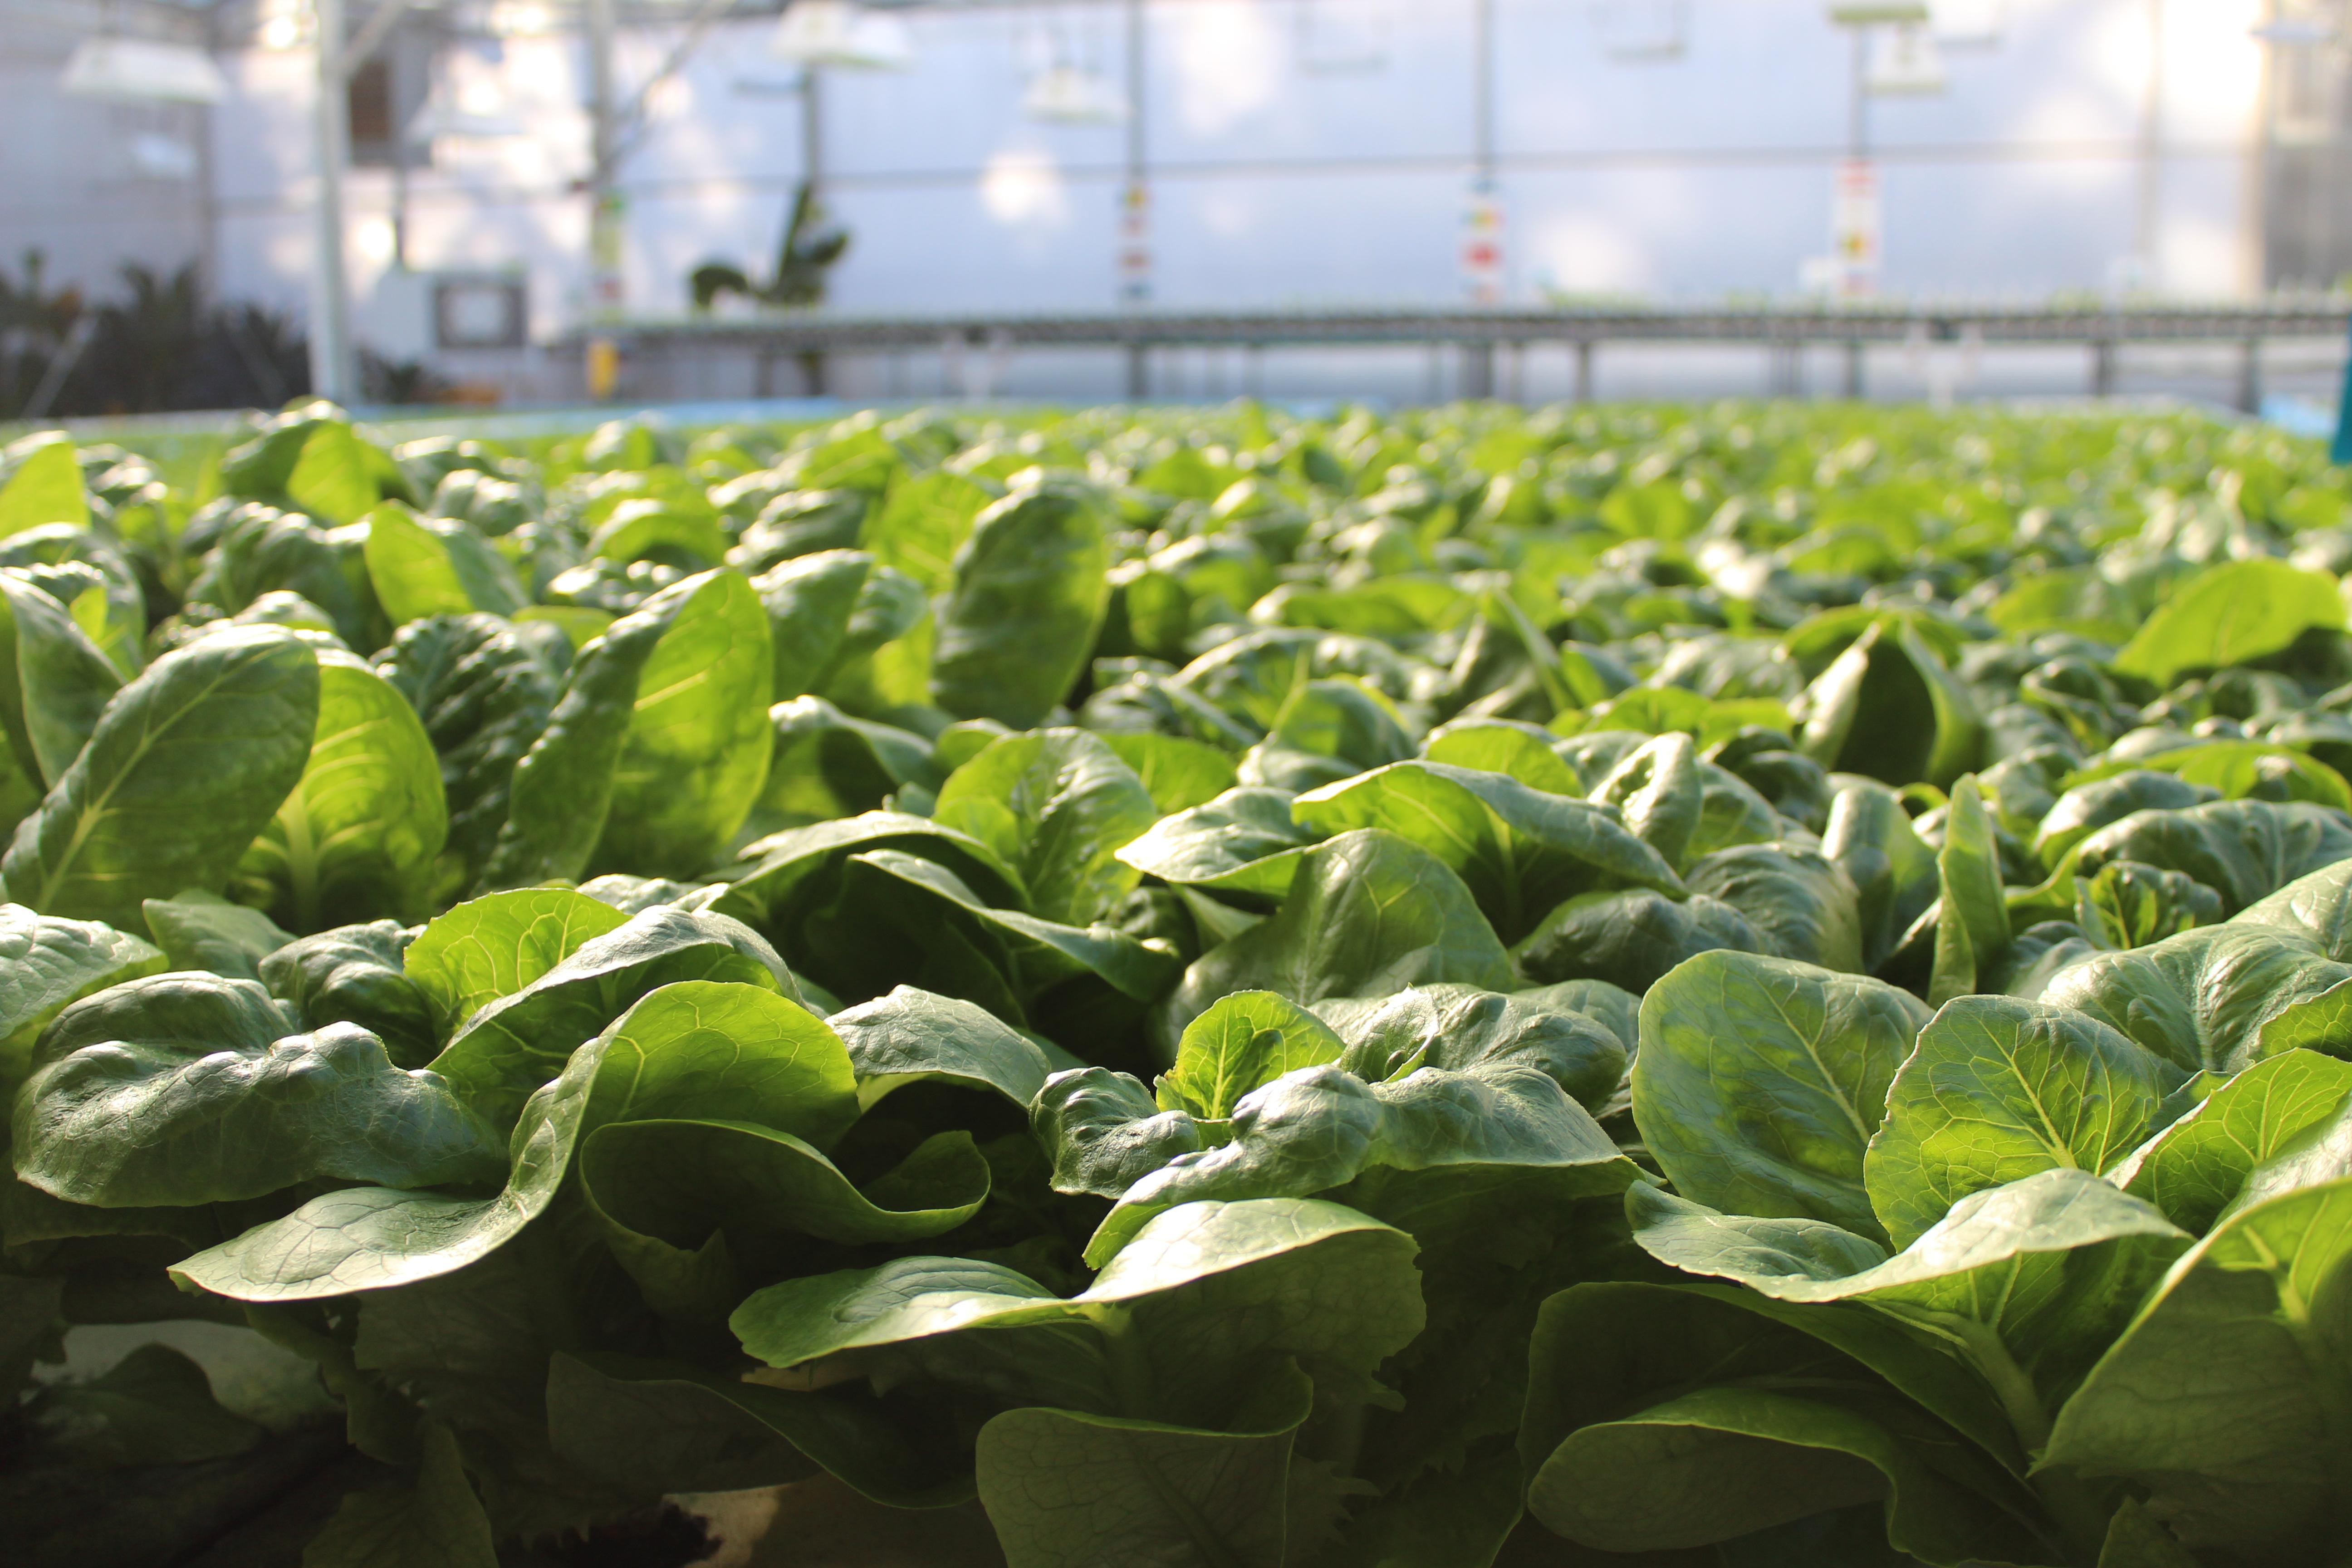 Organic Certified Naturally Grown Aquaponics